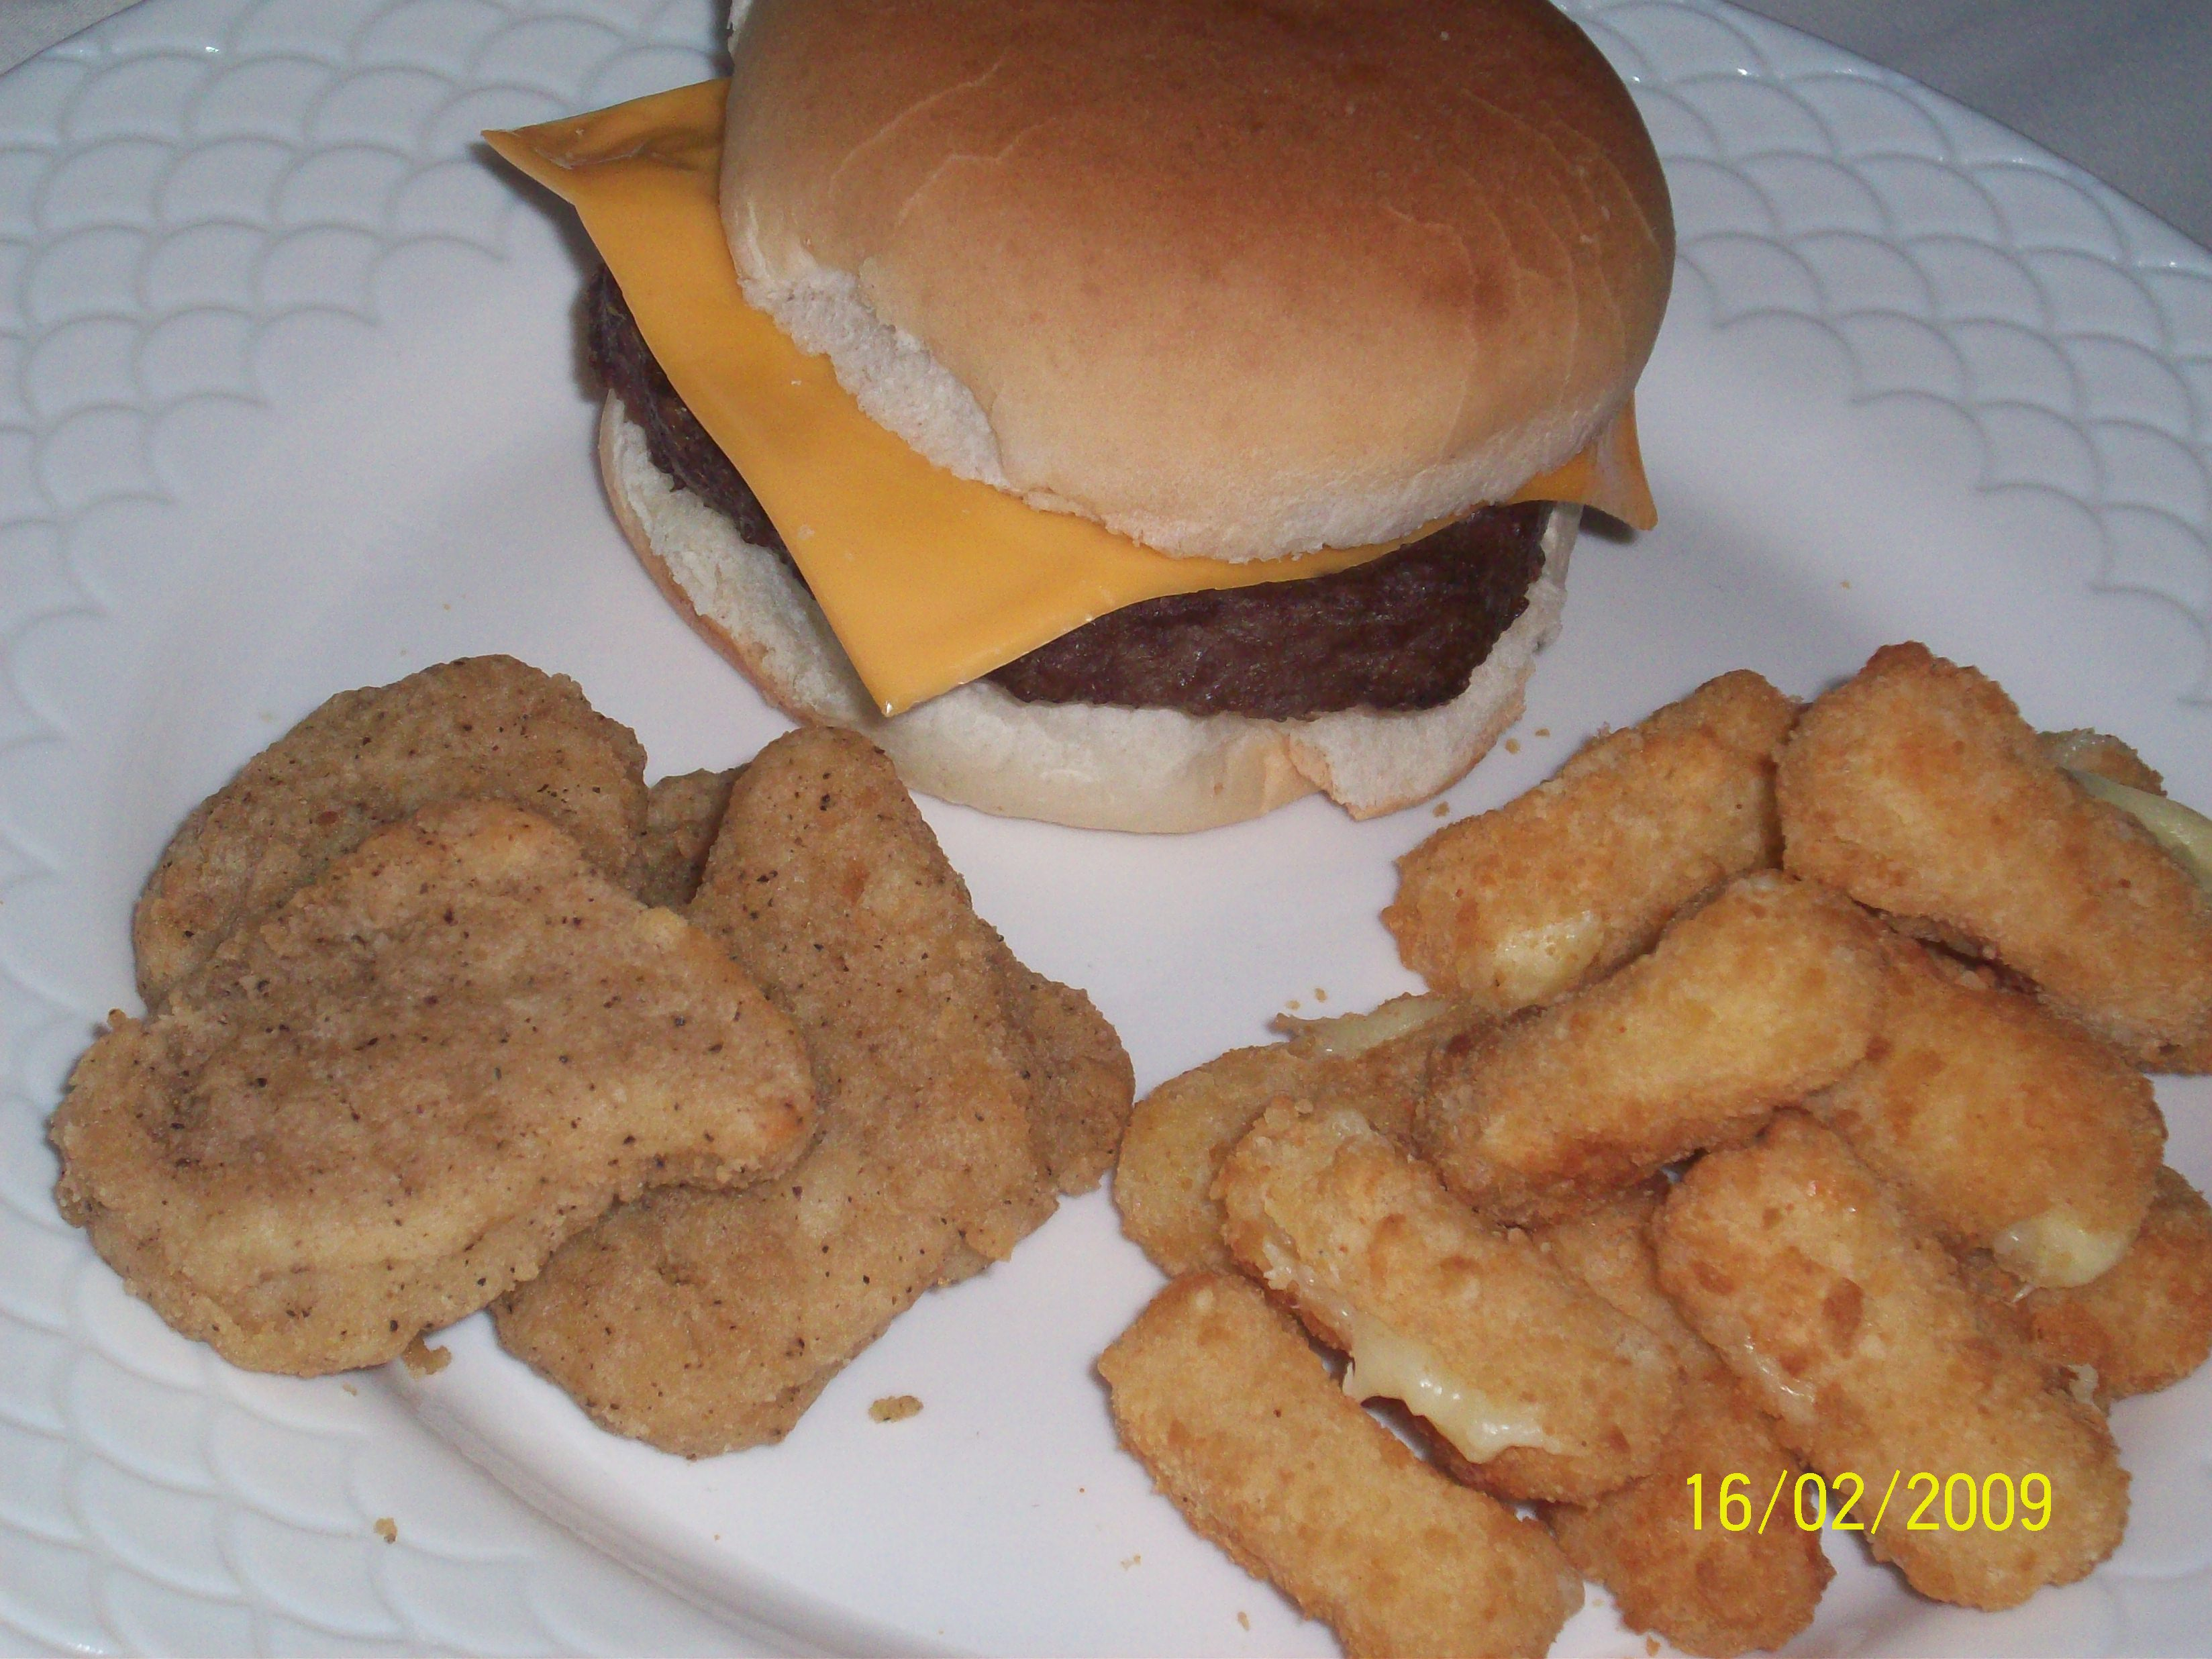 http://foodloader.net/cutie_2009-02-16_Angus_Burger__Cheddar_Cheesesticks_and_Chicken_Nuggets.jpg